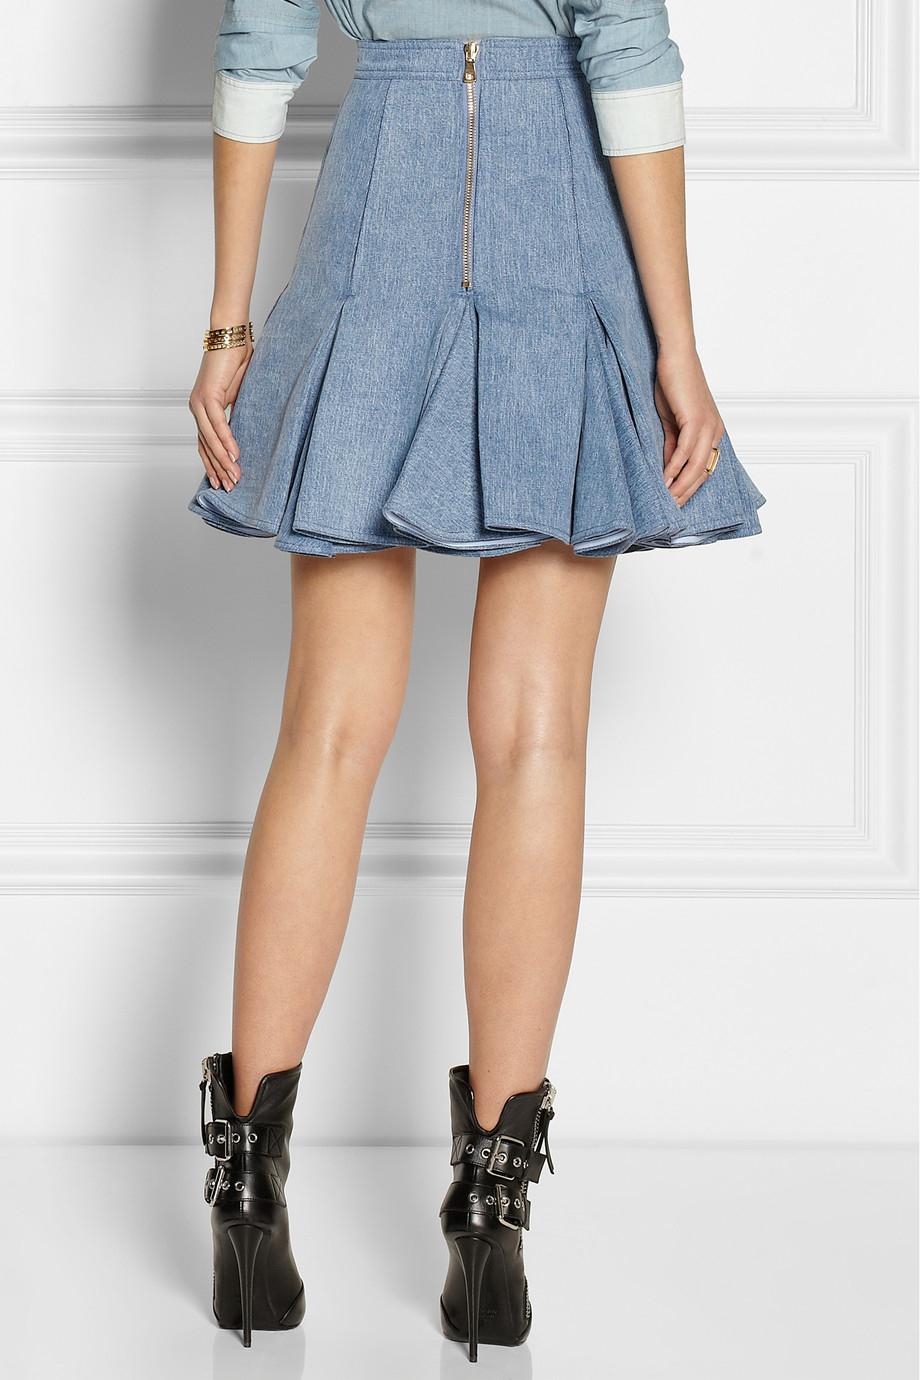 Balmain Pleated Denim Mini Skirt in Blue | Lyst